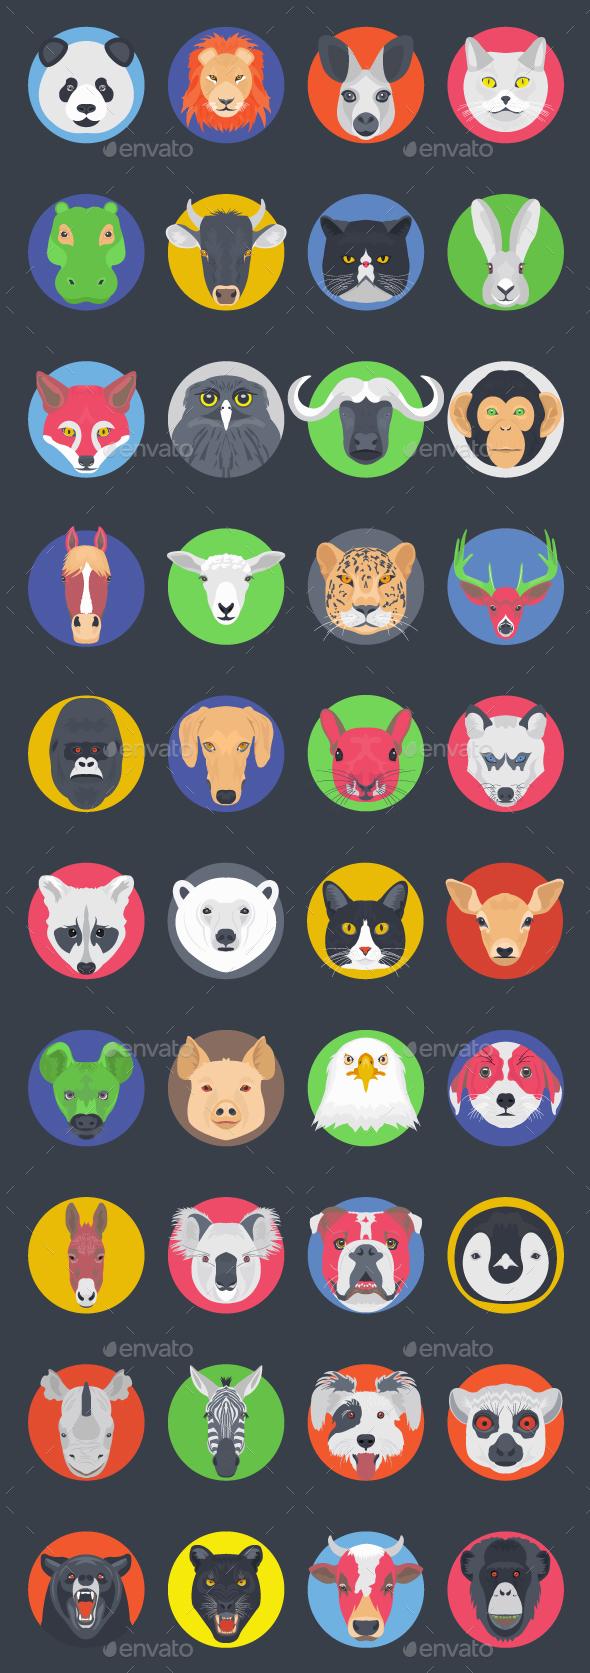 40 Flat Animal Avatars - Icons